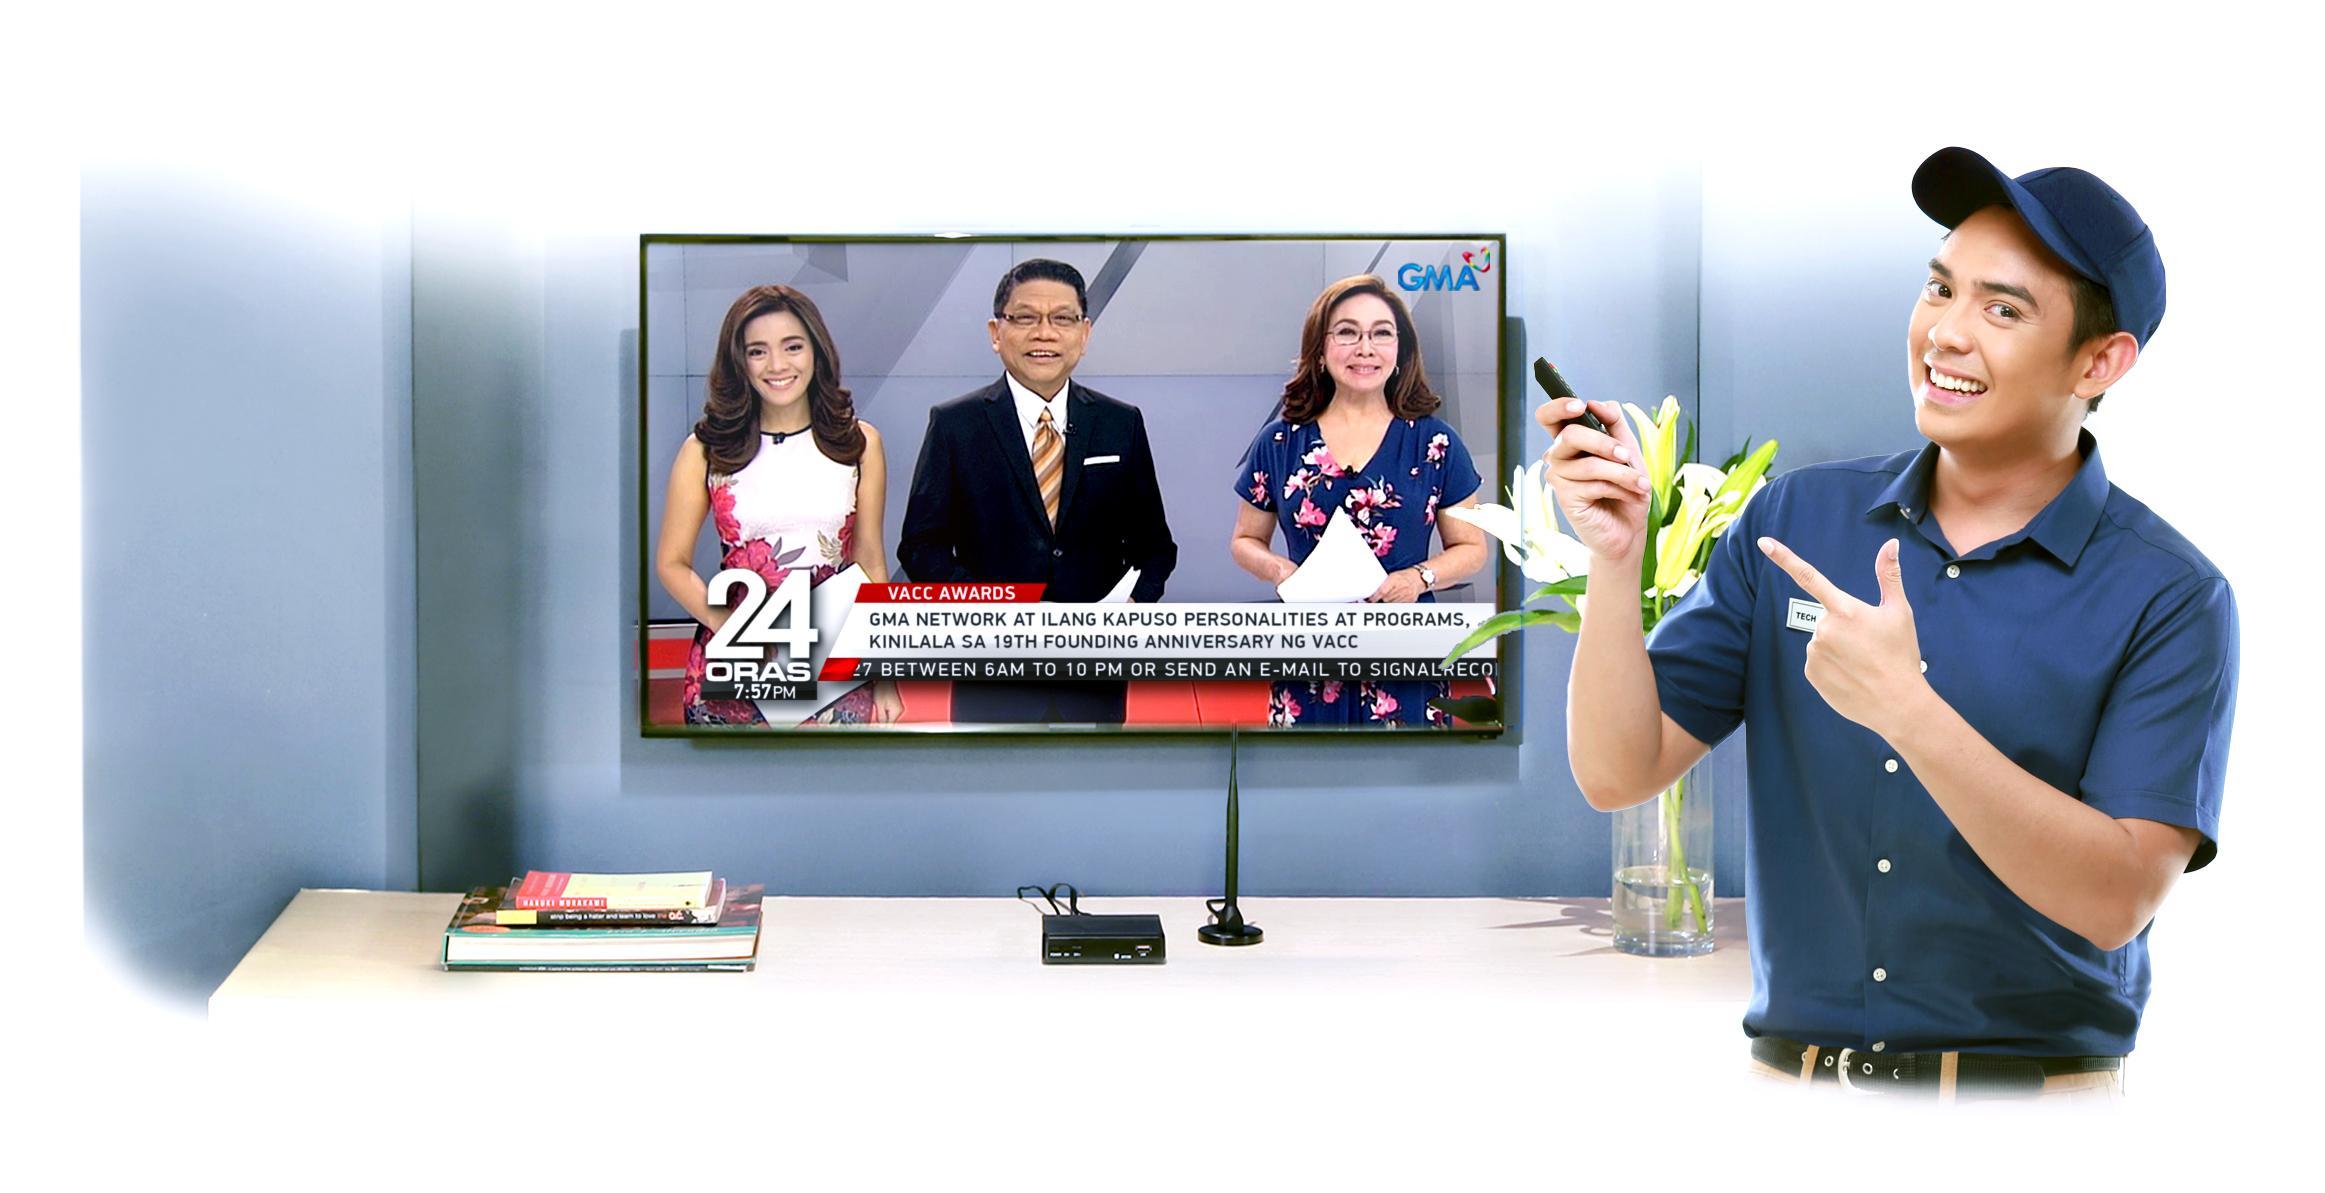 Gma Digital Tv Signal Now Covers Mega Manila Scitech